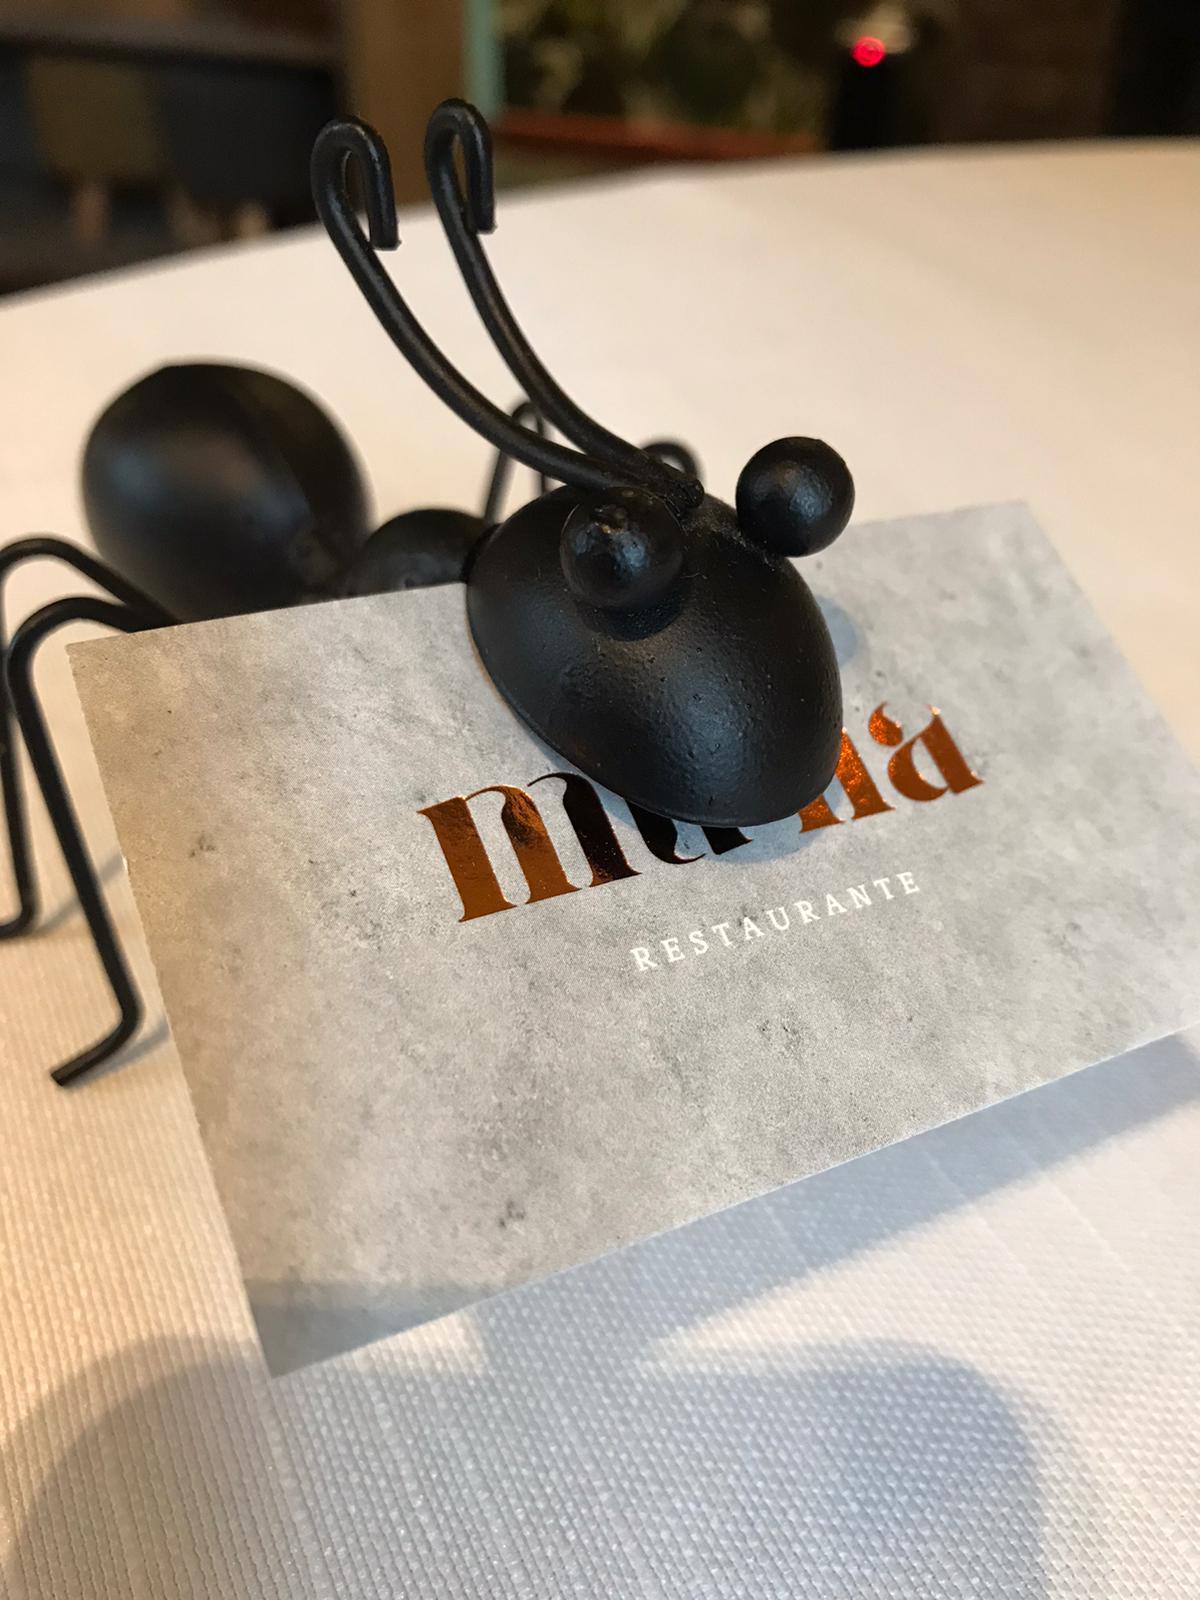 Reseña Gastronómica: Restaurante MU-Na de Ponferrada 16